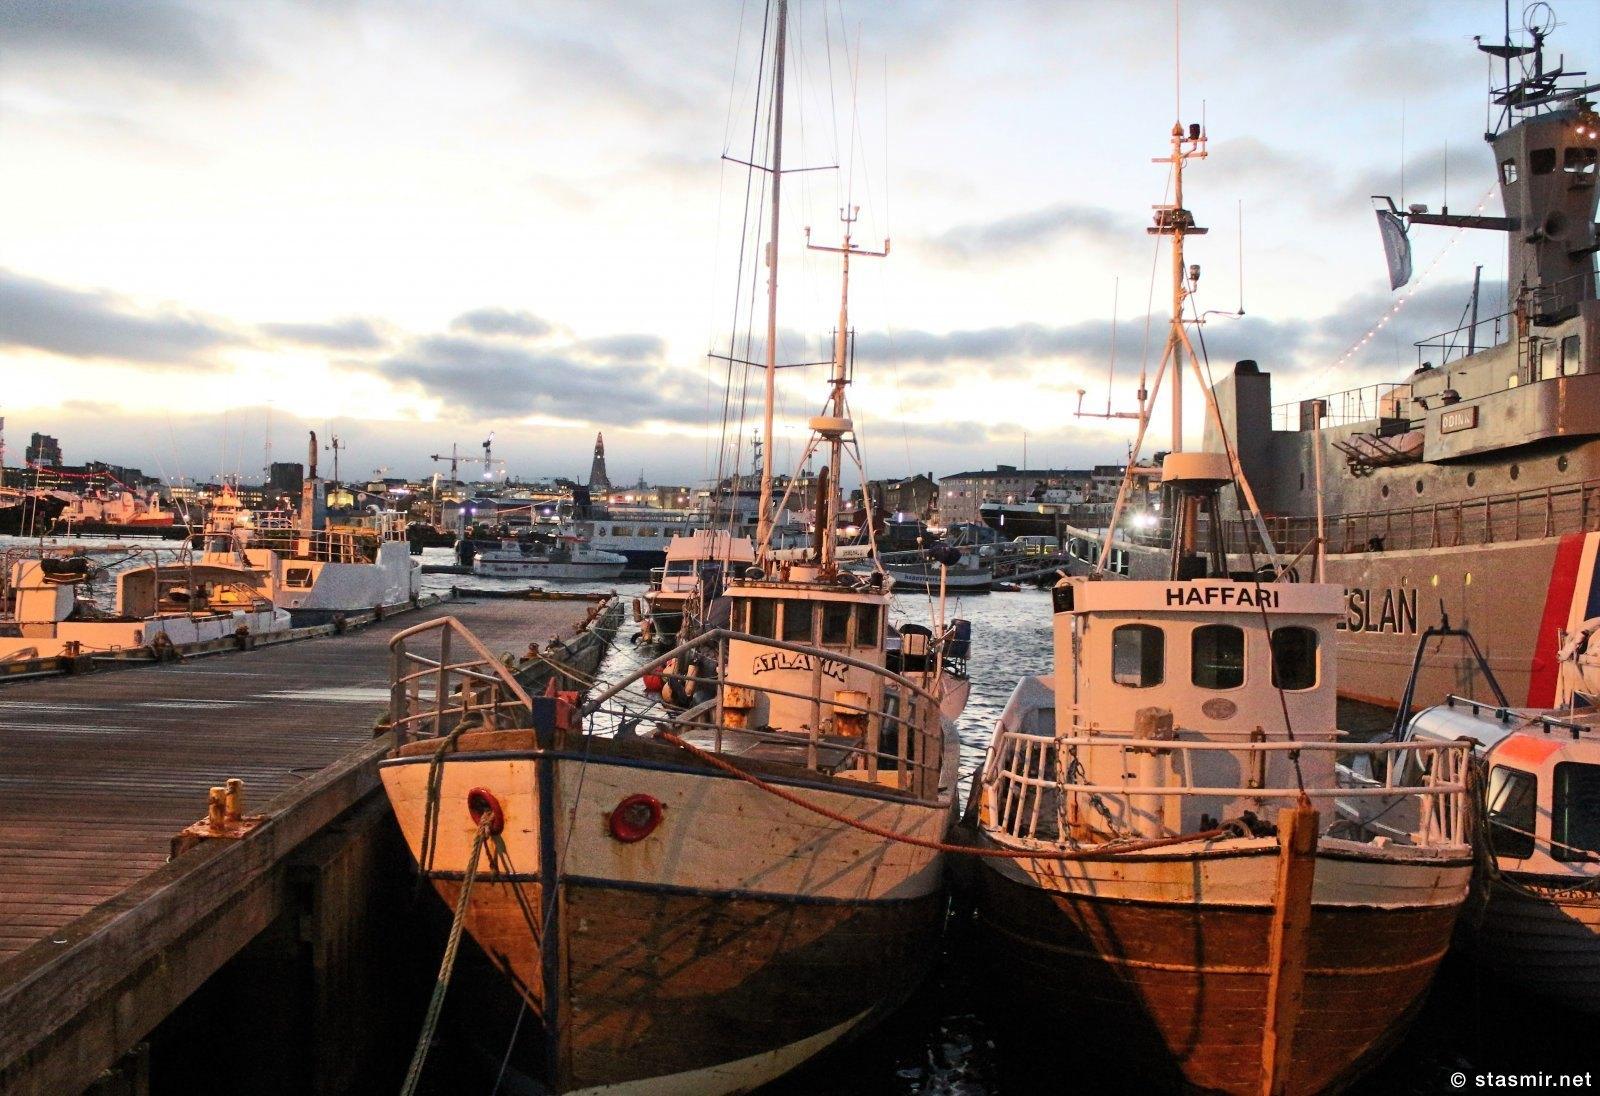 кораблики в гавани Рейкьявика, Факсафлои, фото Стасмир, Photo Stasmir